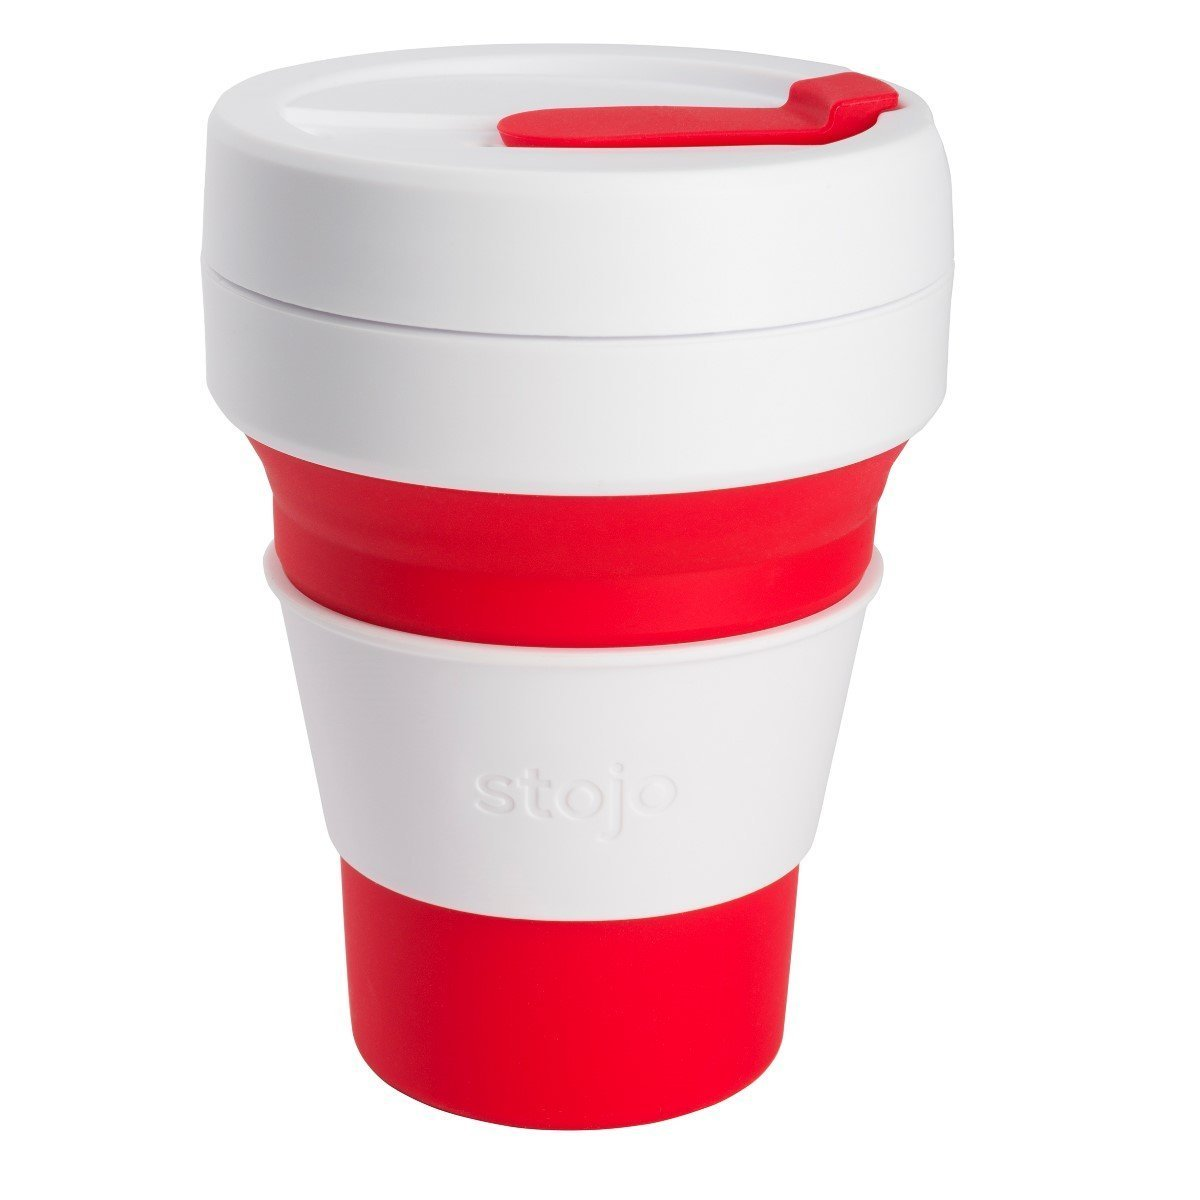 Galleon Stojo Collapsible Cup Silicone Travel Mug